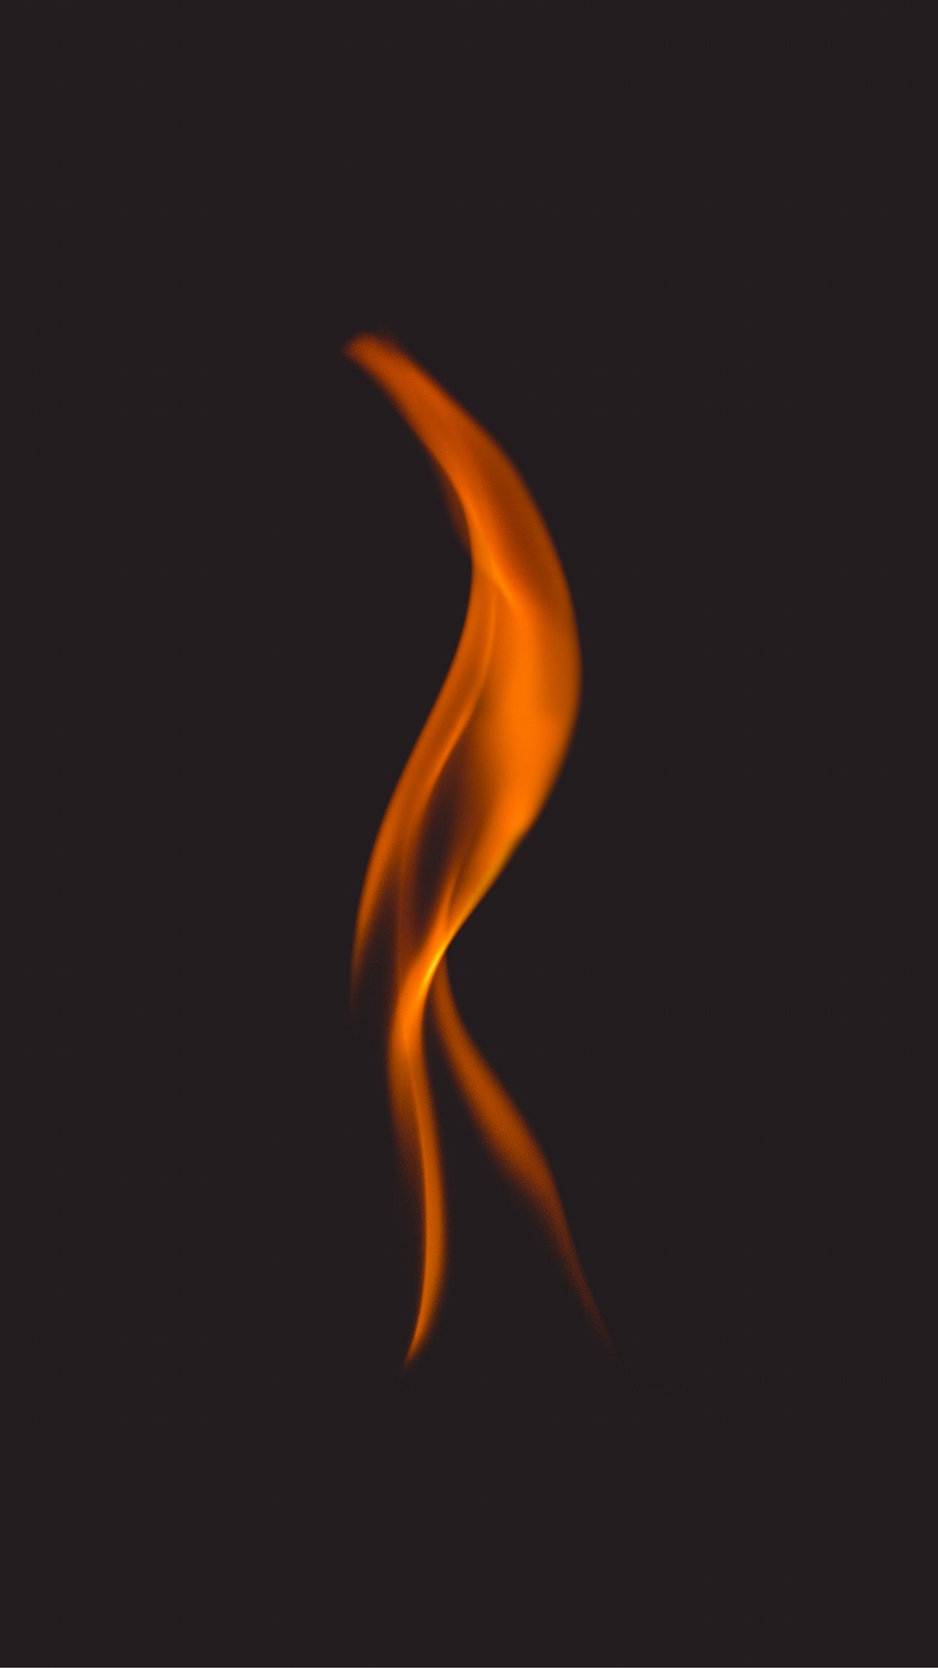 Wallpaper Fire Flame Dark Background Black Whatsapp Wallpaper Hd 4k 938x1668 Wallpaper Teahub Io